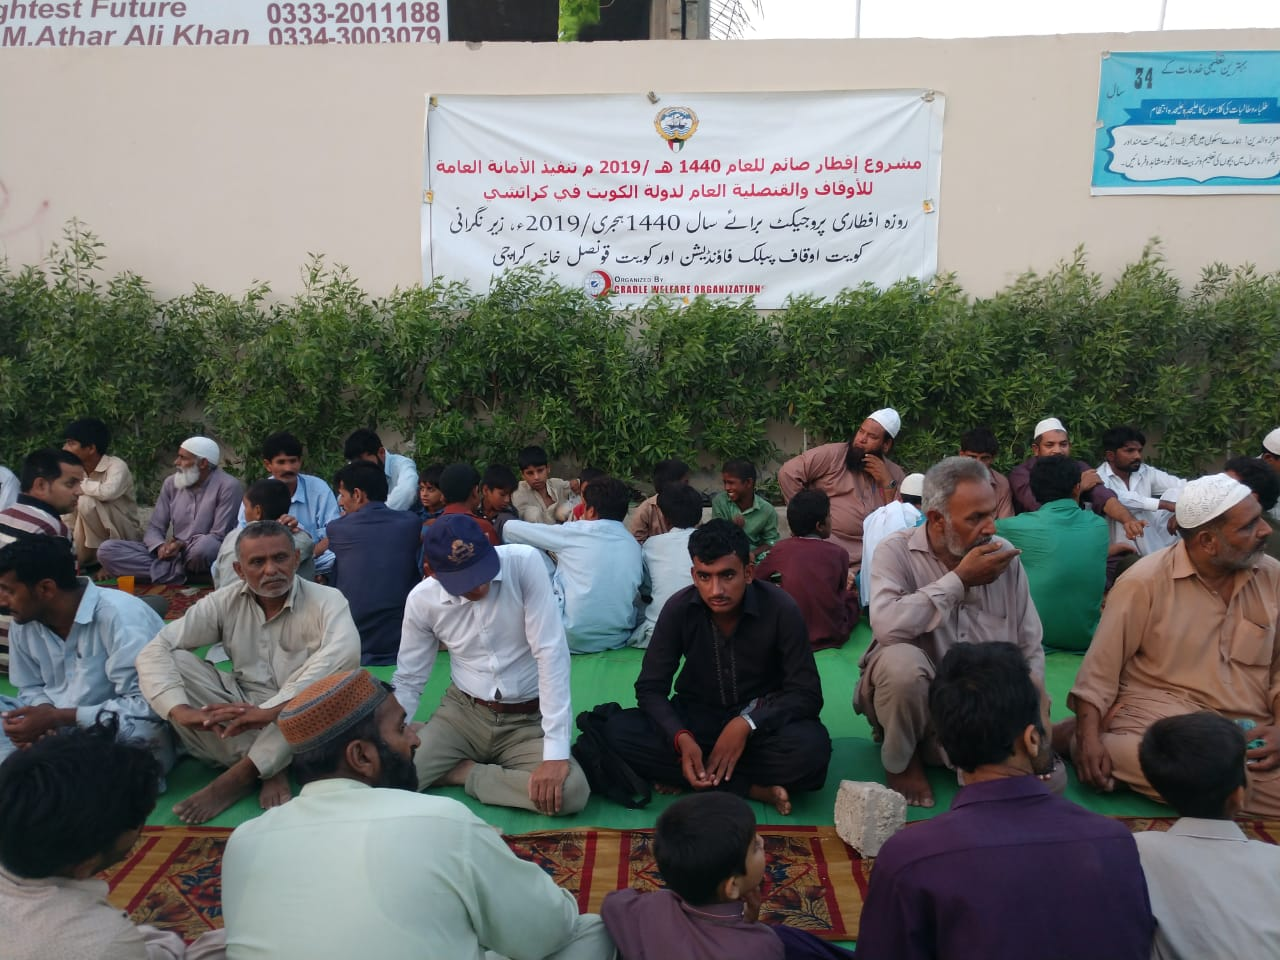 Avail good deeds through Iftar Project 1440 Hijri